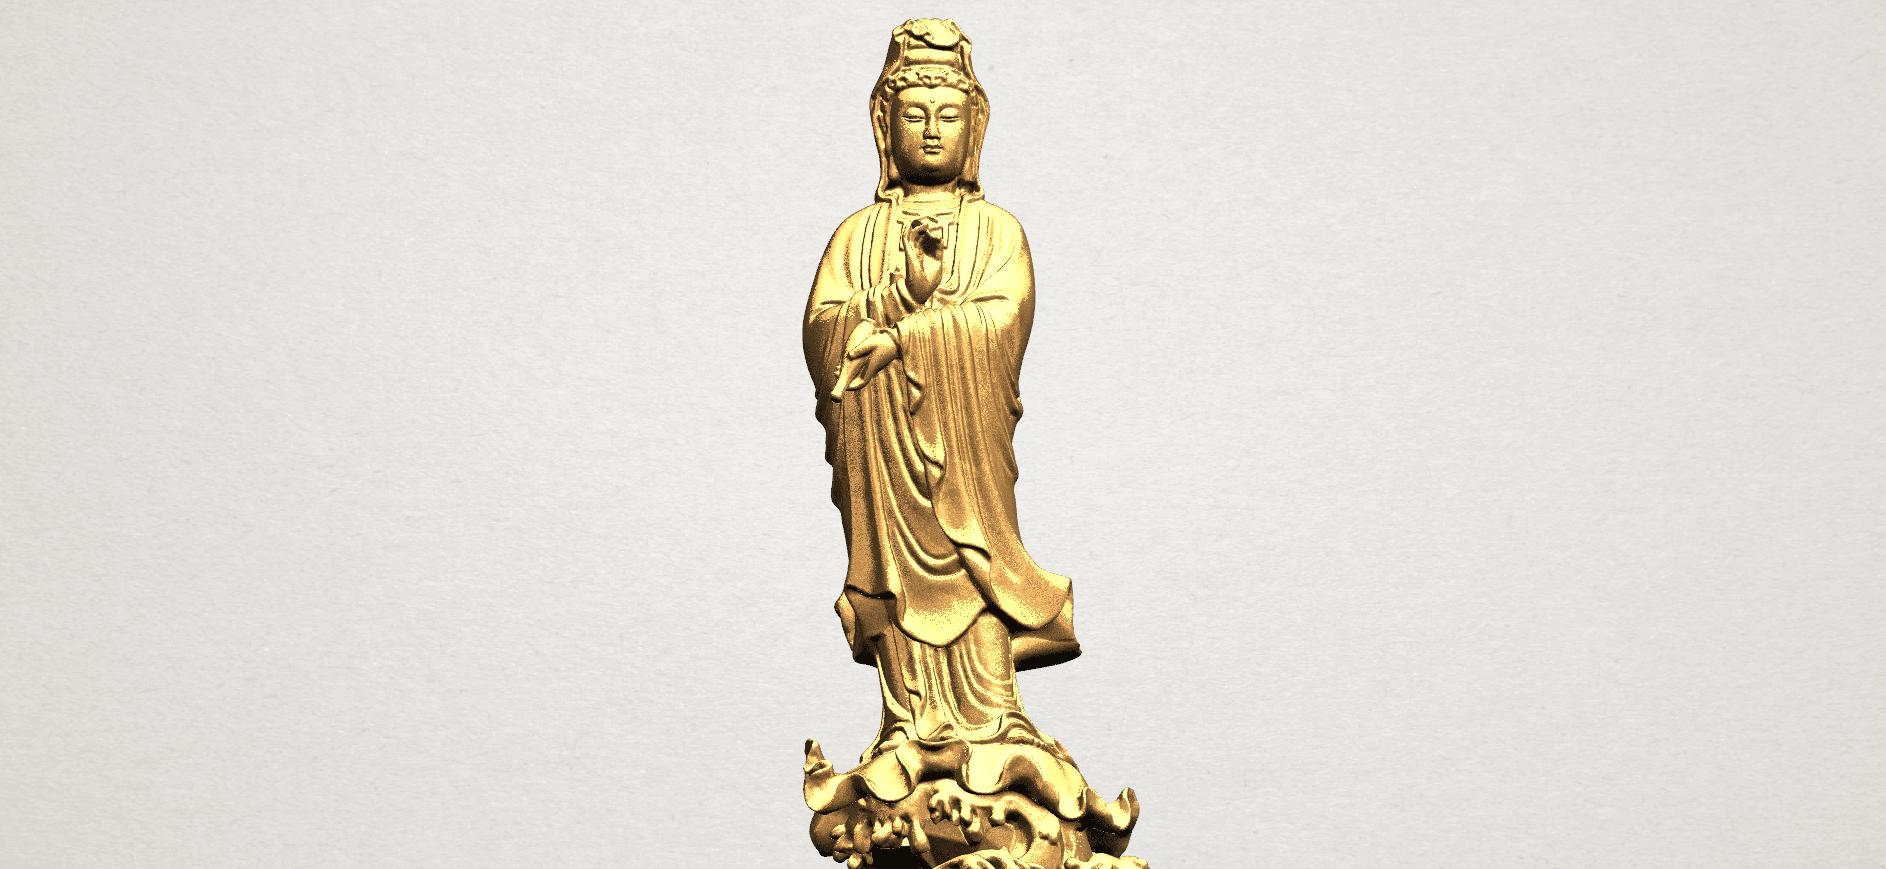 Avalokitesvara Buddha - Standing (v) A10.png Download free STL file Avalokitesvara Buddha - Standing 05 • 3D printer template, GeorgesNikkei